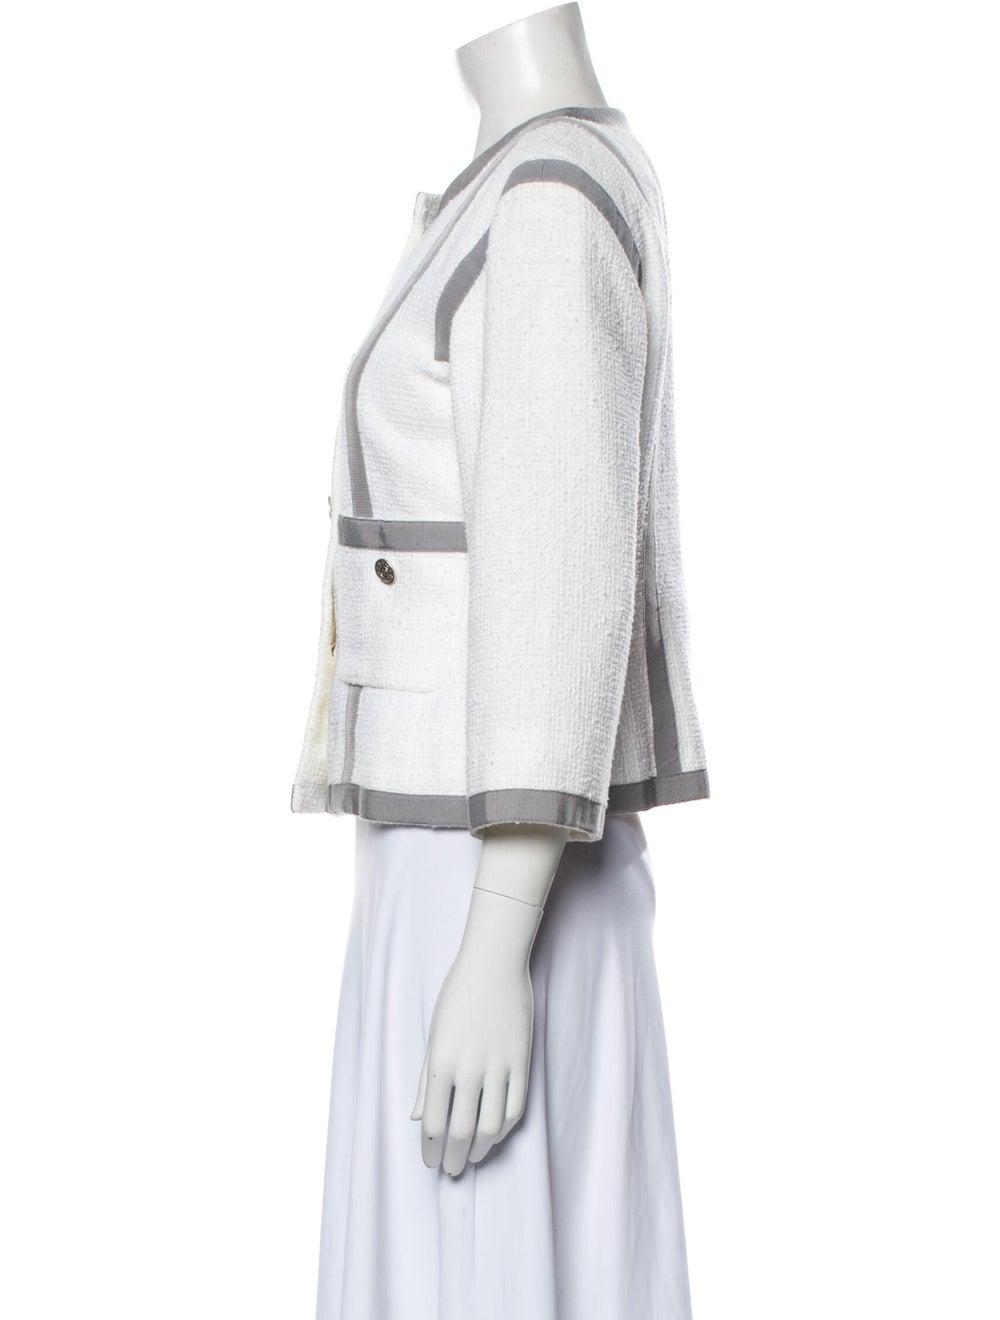 Chanel 2013 Striped Jacket - image 2